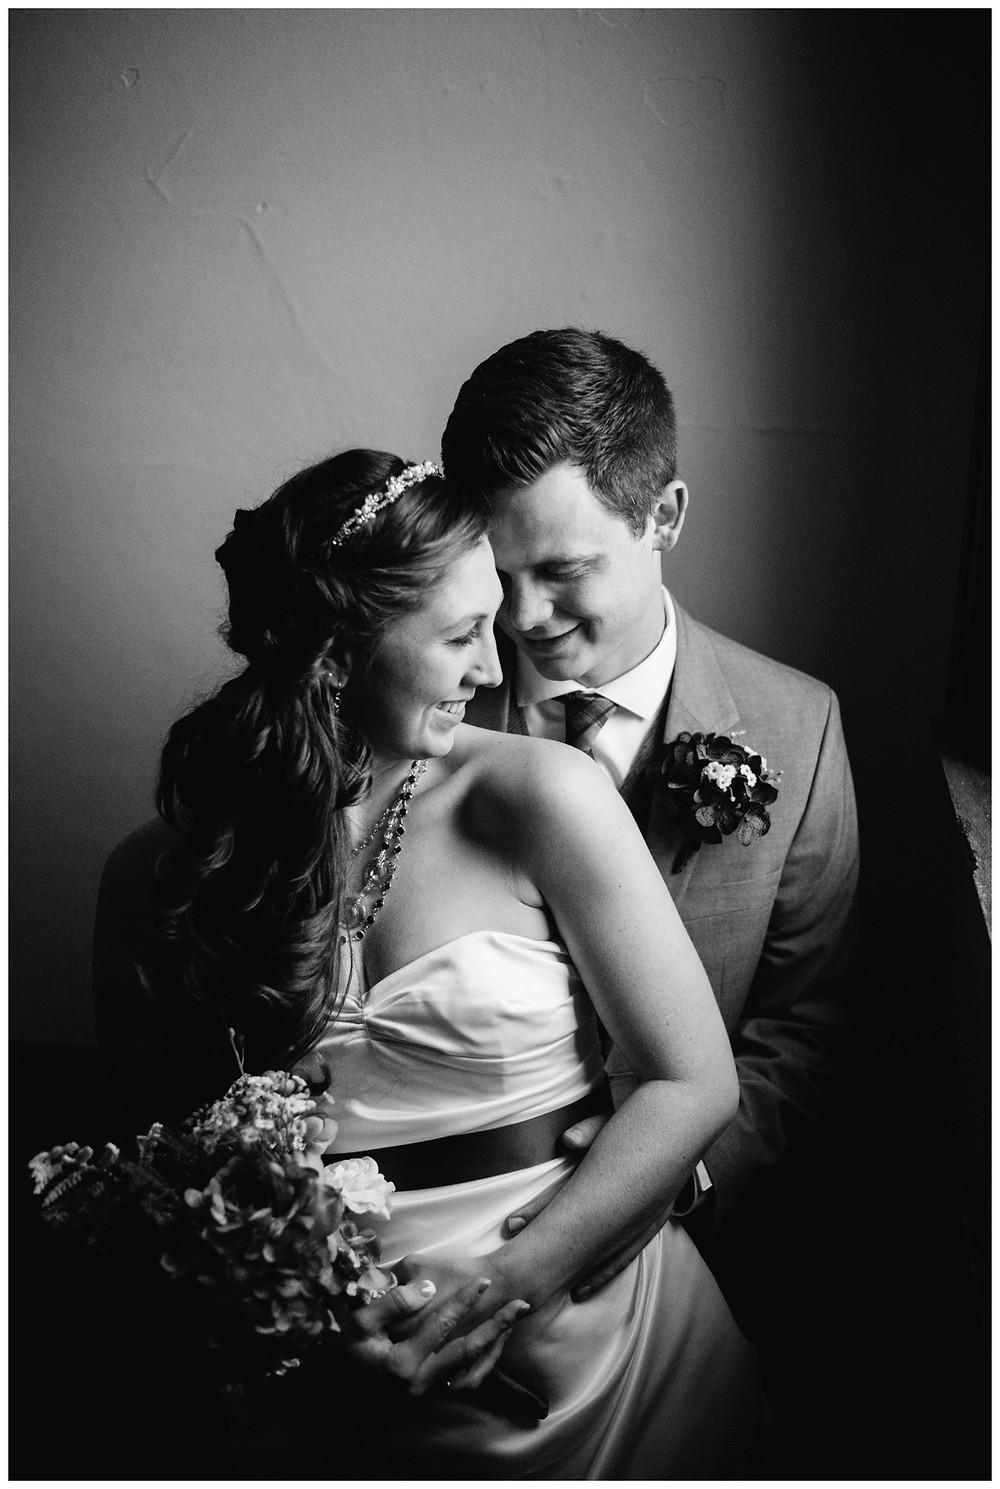 groom-holds-bride-at-milwaukee-wedding-by-green-bay-wedding-photographer-kyra-rane-photographer